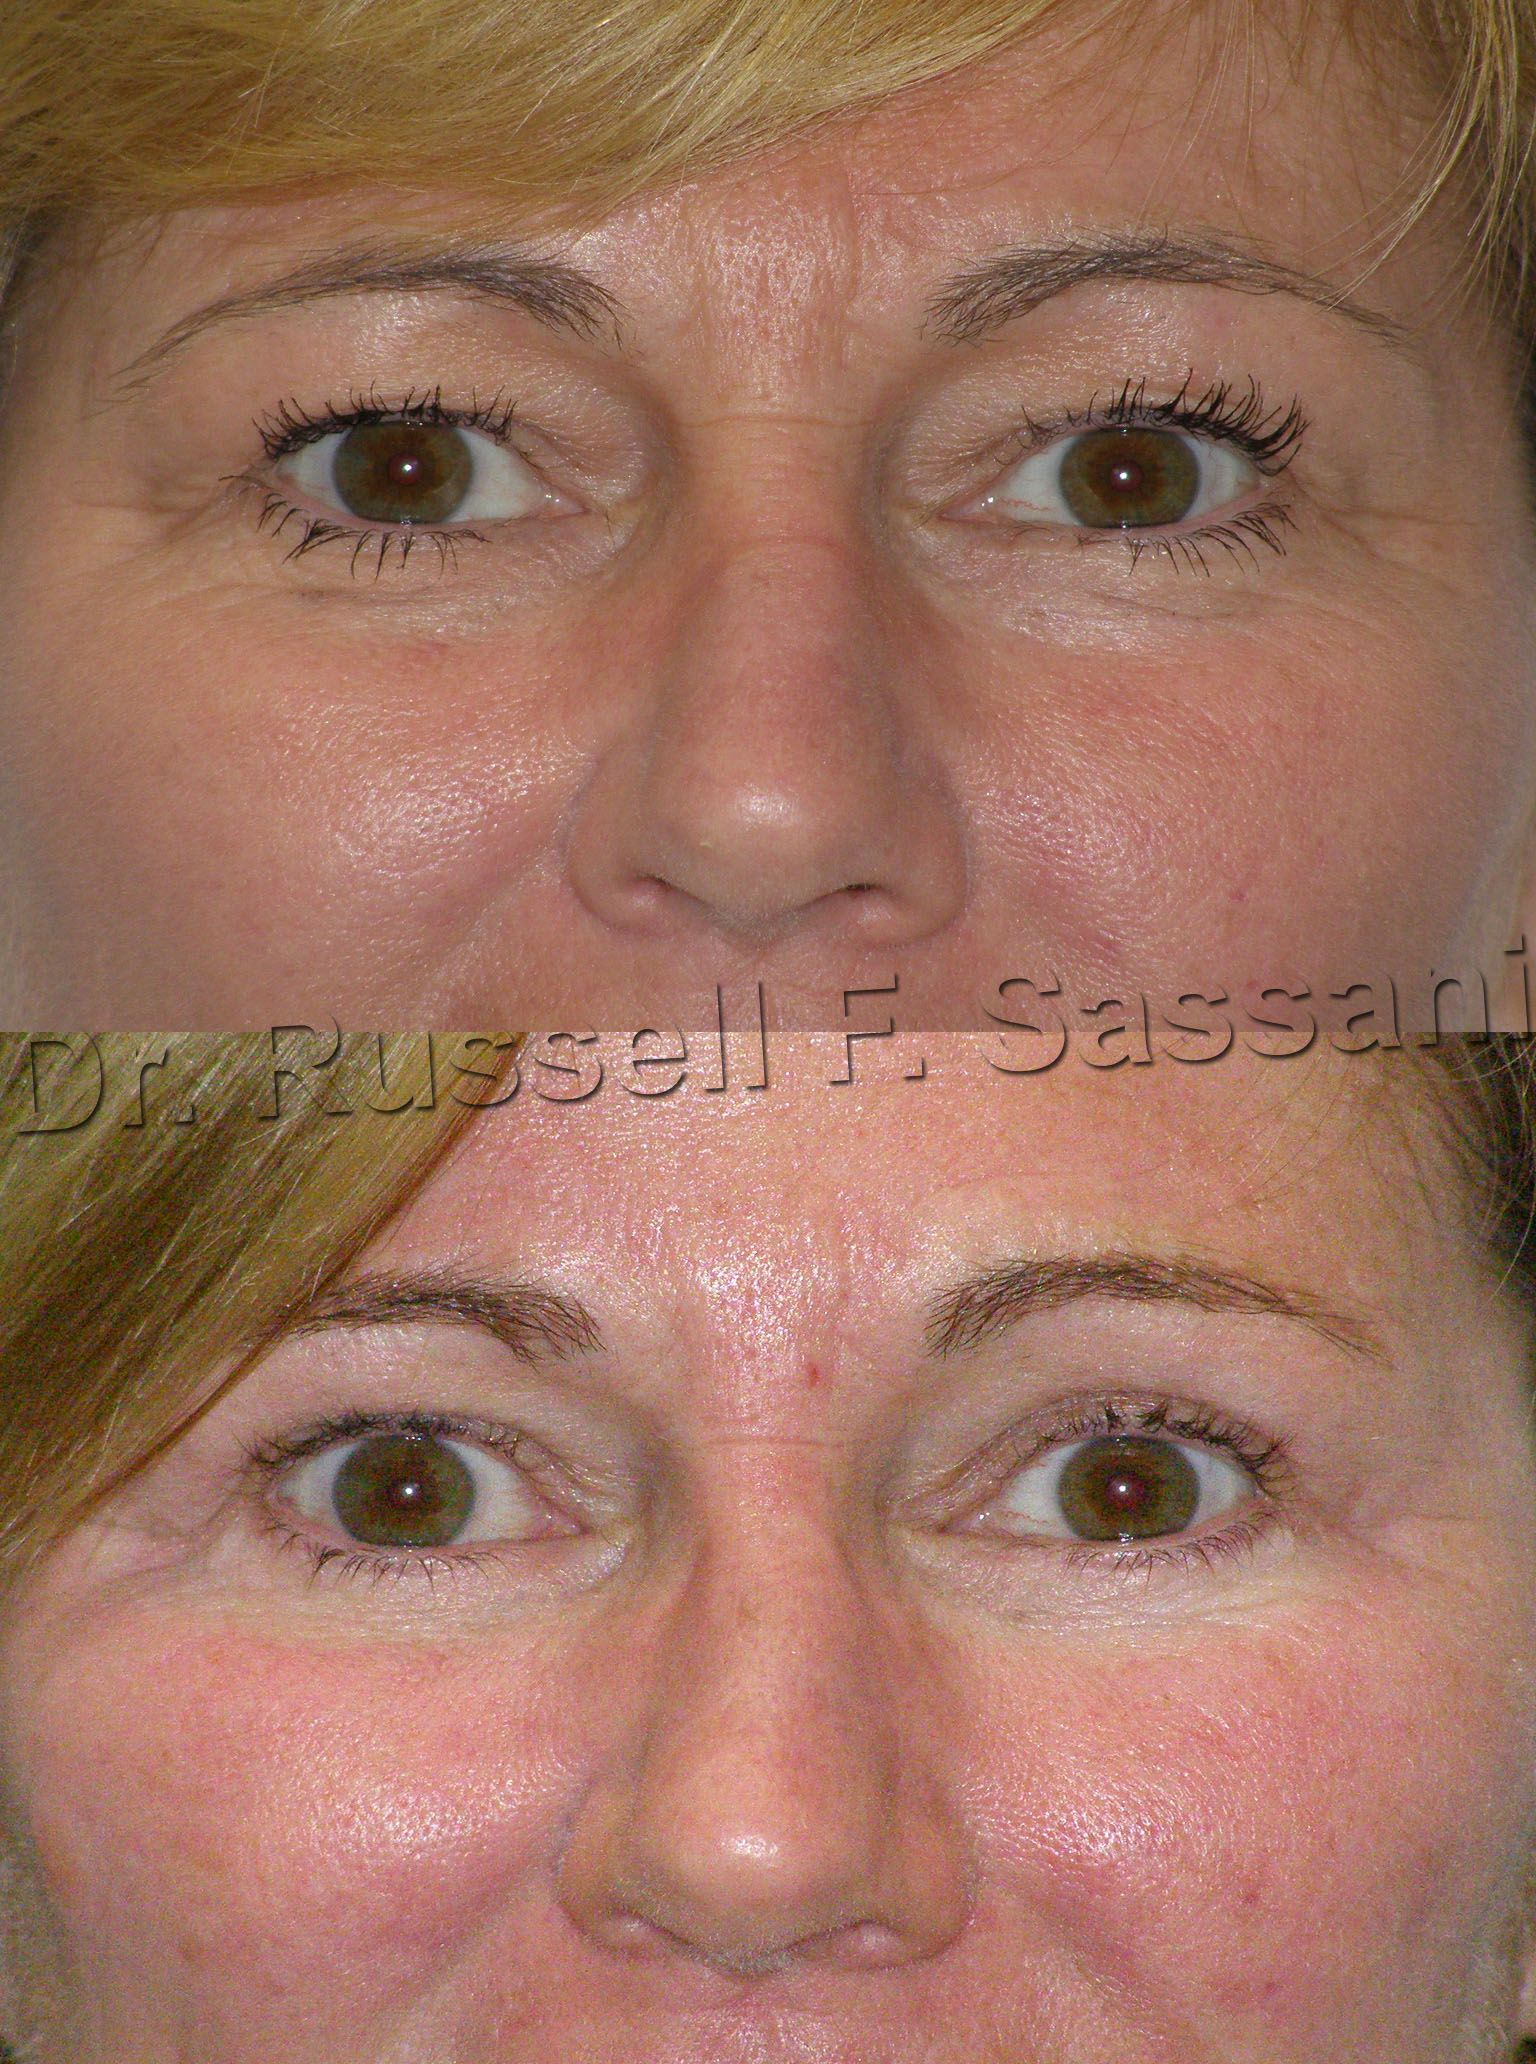 Before After Of A Eyelid Surgery Plasticsurgery Eyelid